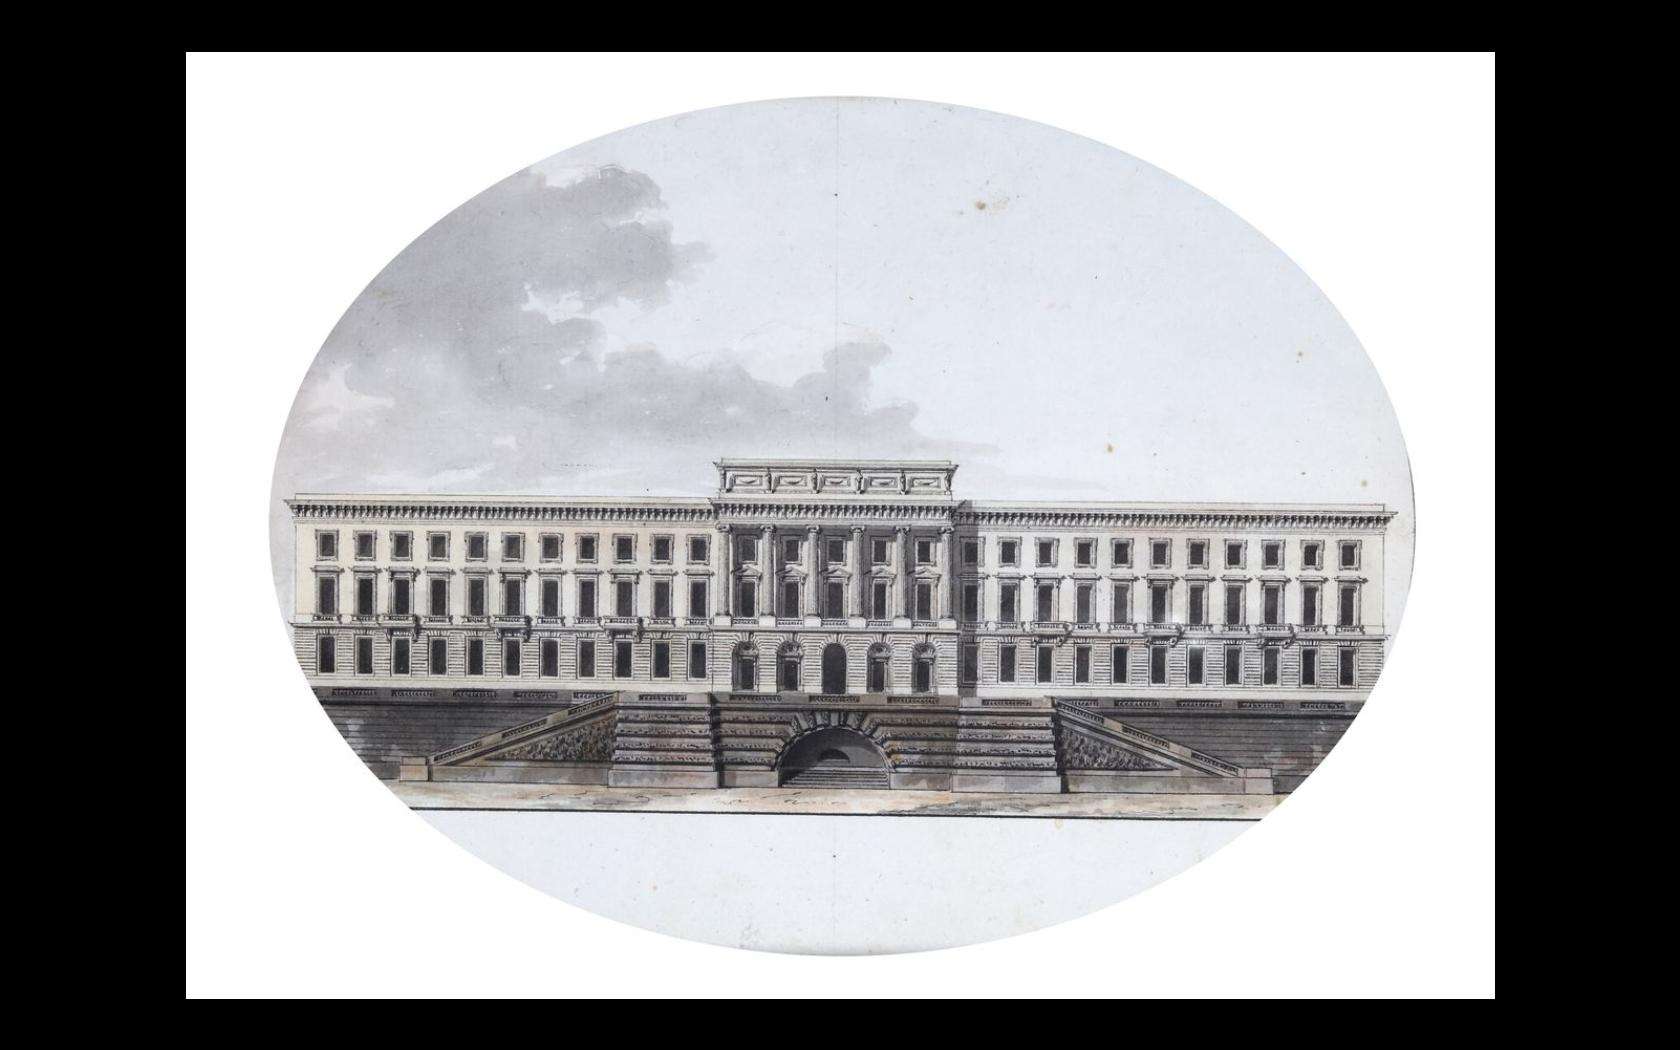 Jean Nicolas Louis Durand 1760 1834 The Hotel De La Monnaie Oval Drawing In Watercolor Pen And Black Ink Architecture Drawing Architecture Details Durand